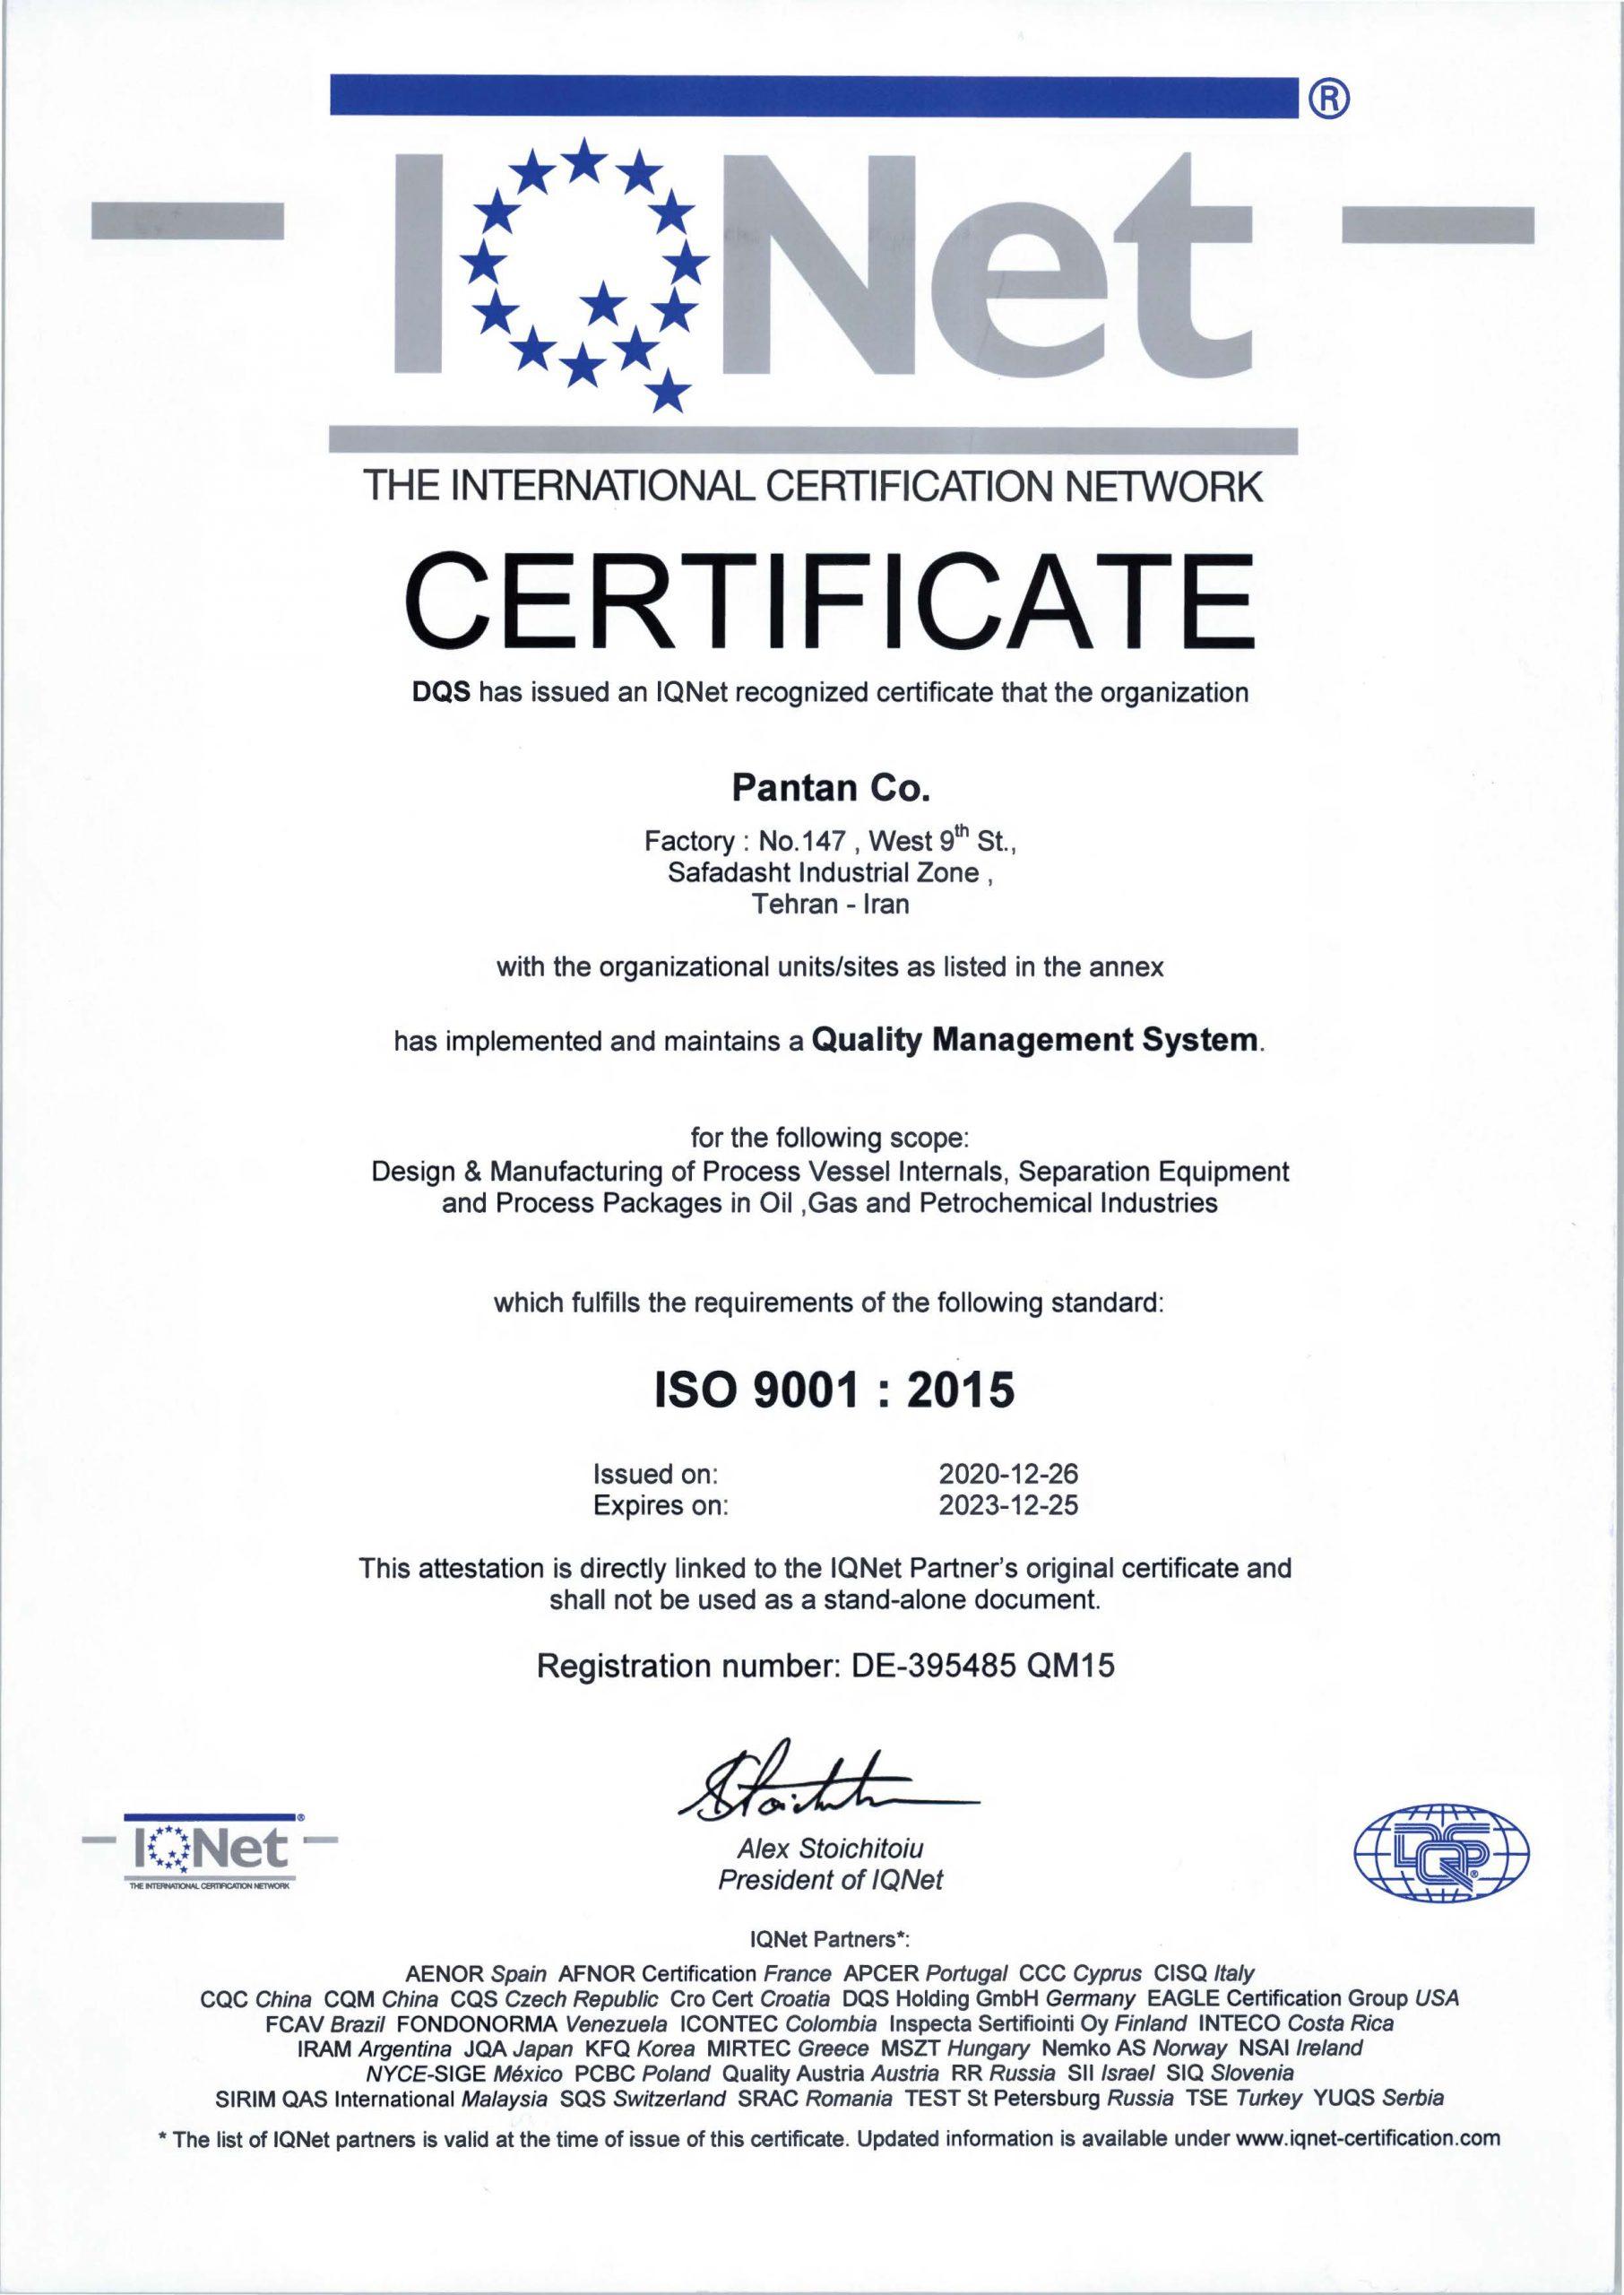 IQNet PANTAN ISO 9001:2015